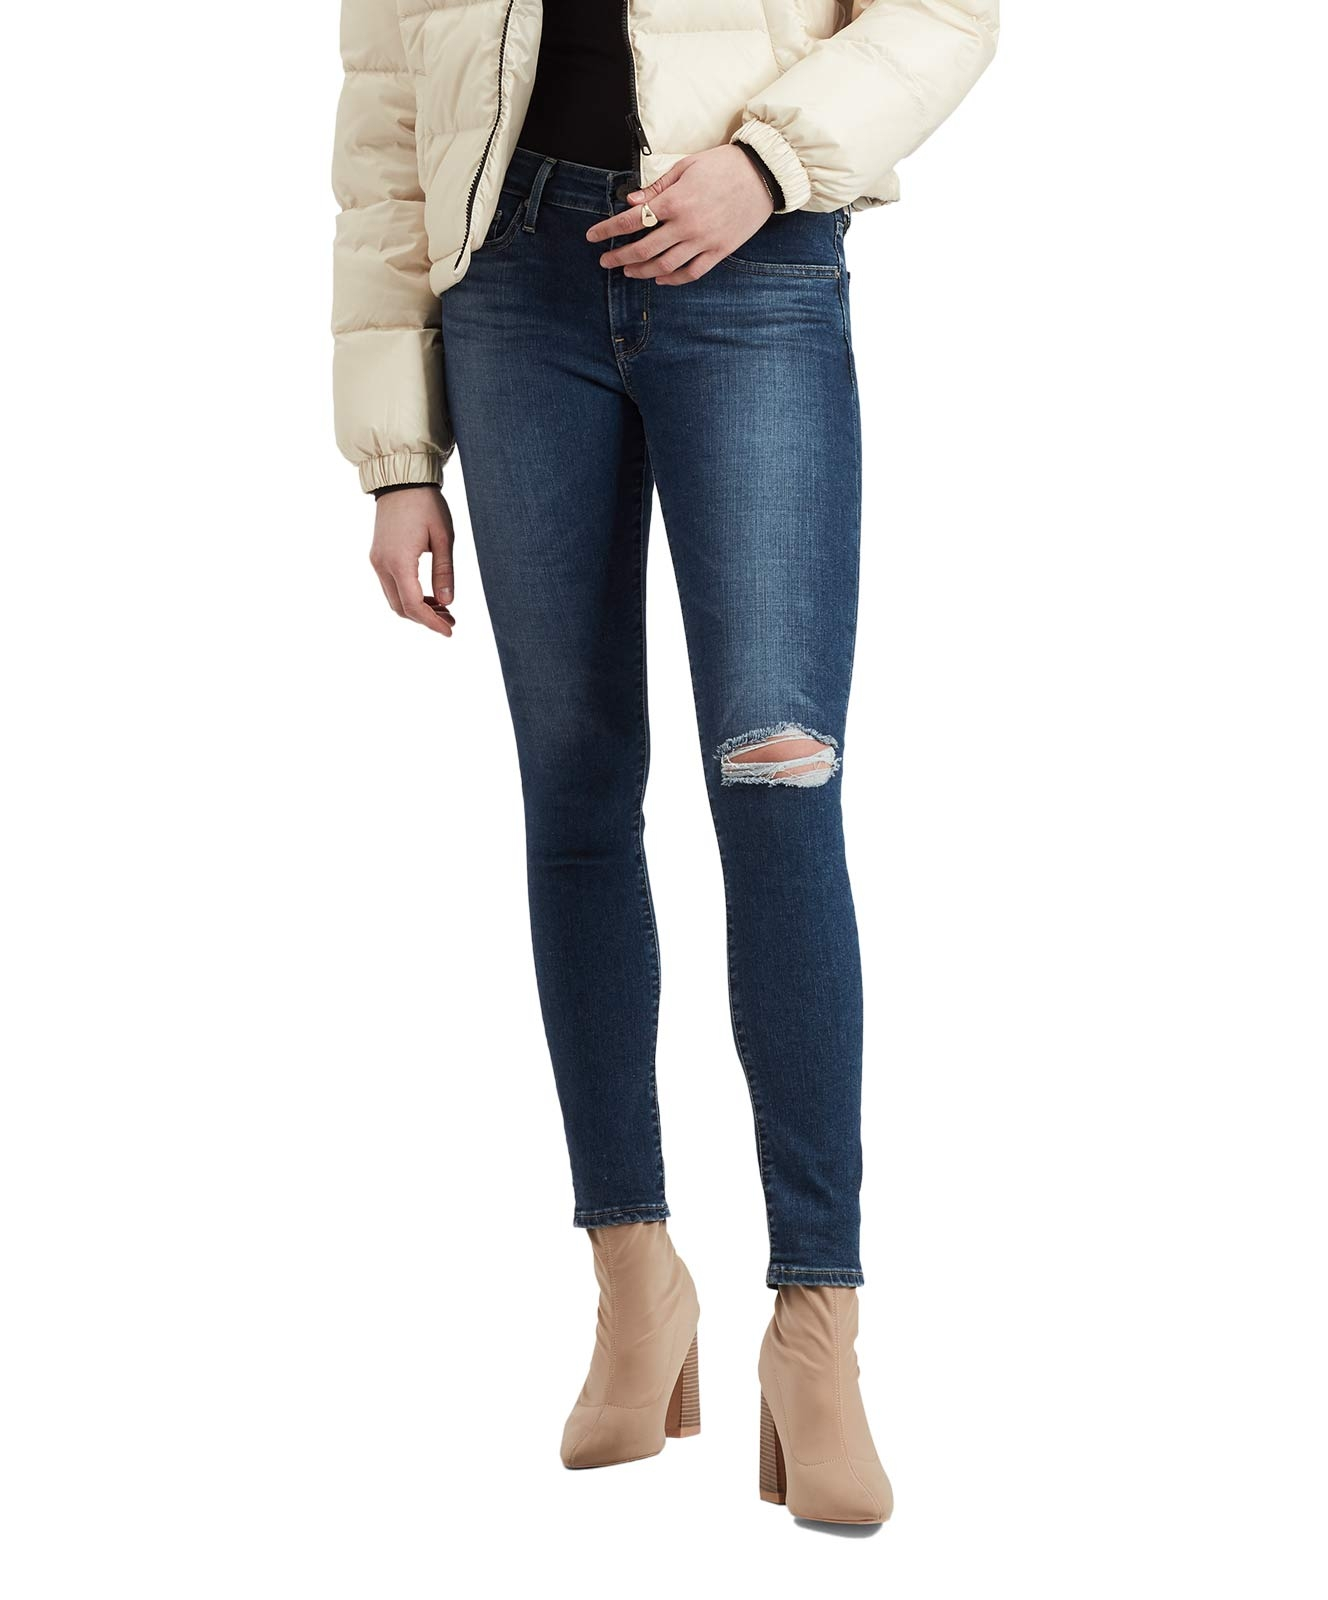 Hosen für Frauen - Levi's Skinny Jeans 711 im dunklem Used Look  - Onlineshop Jeans Meile